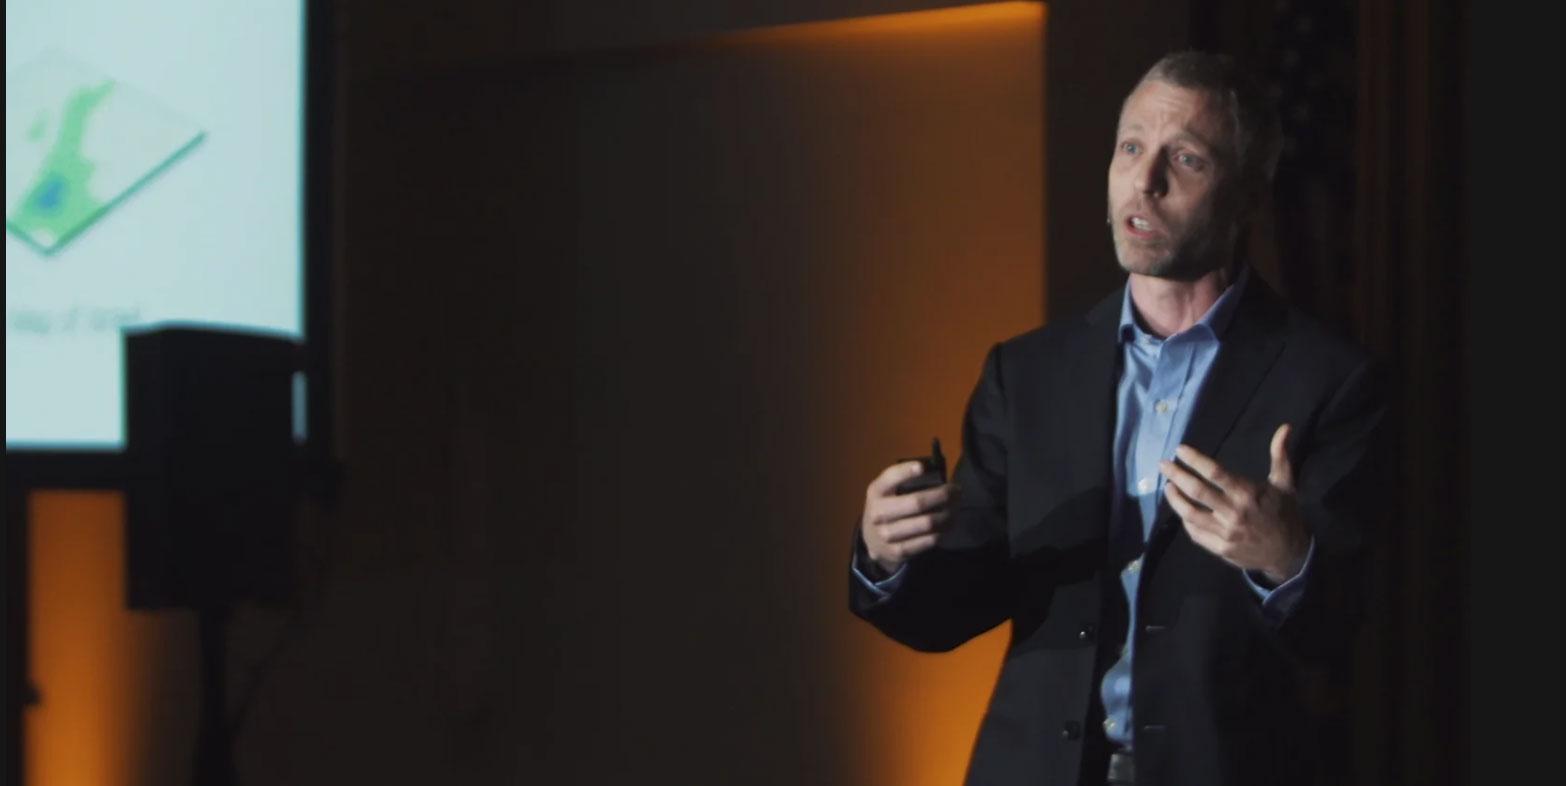 FIBA-InnovationFusion 2018-Waze Presentation